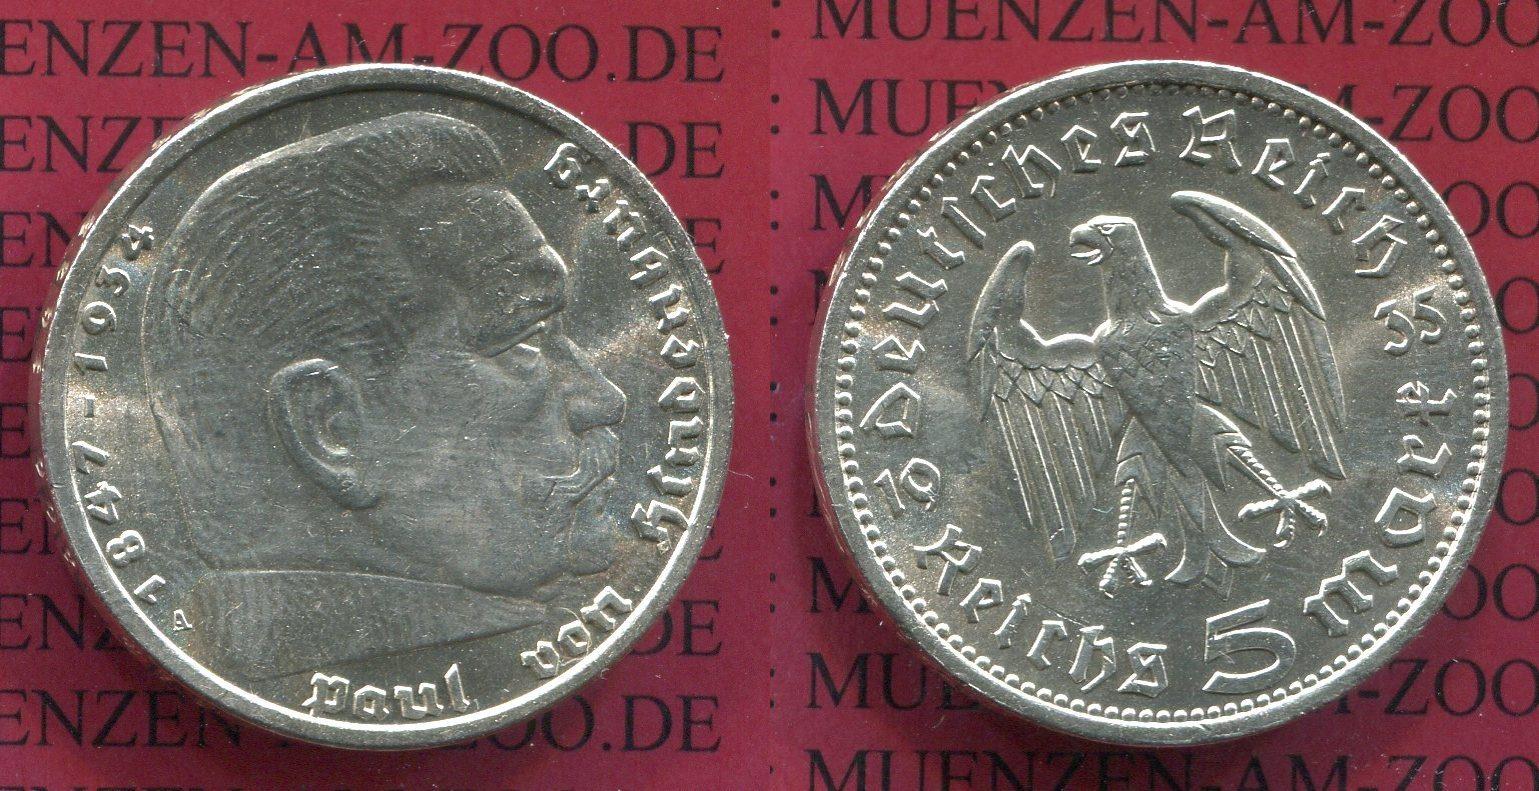 5 Reichsmark 1935 A Iii Reich Iii Reich 5 Reichsmark 1935 A